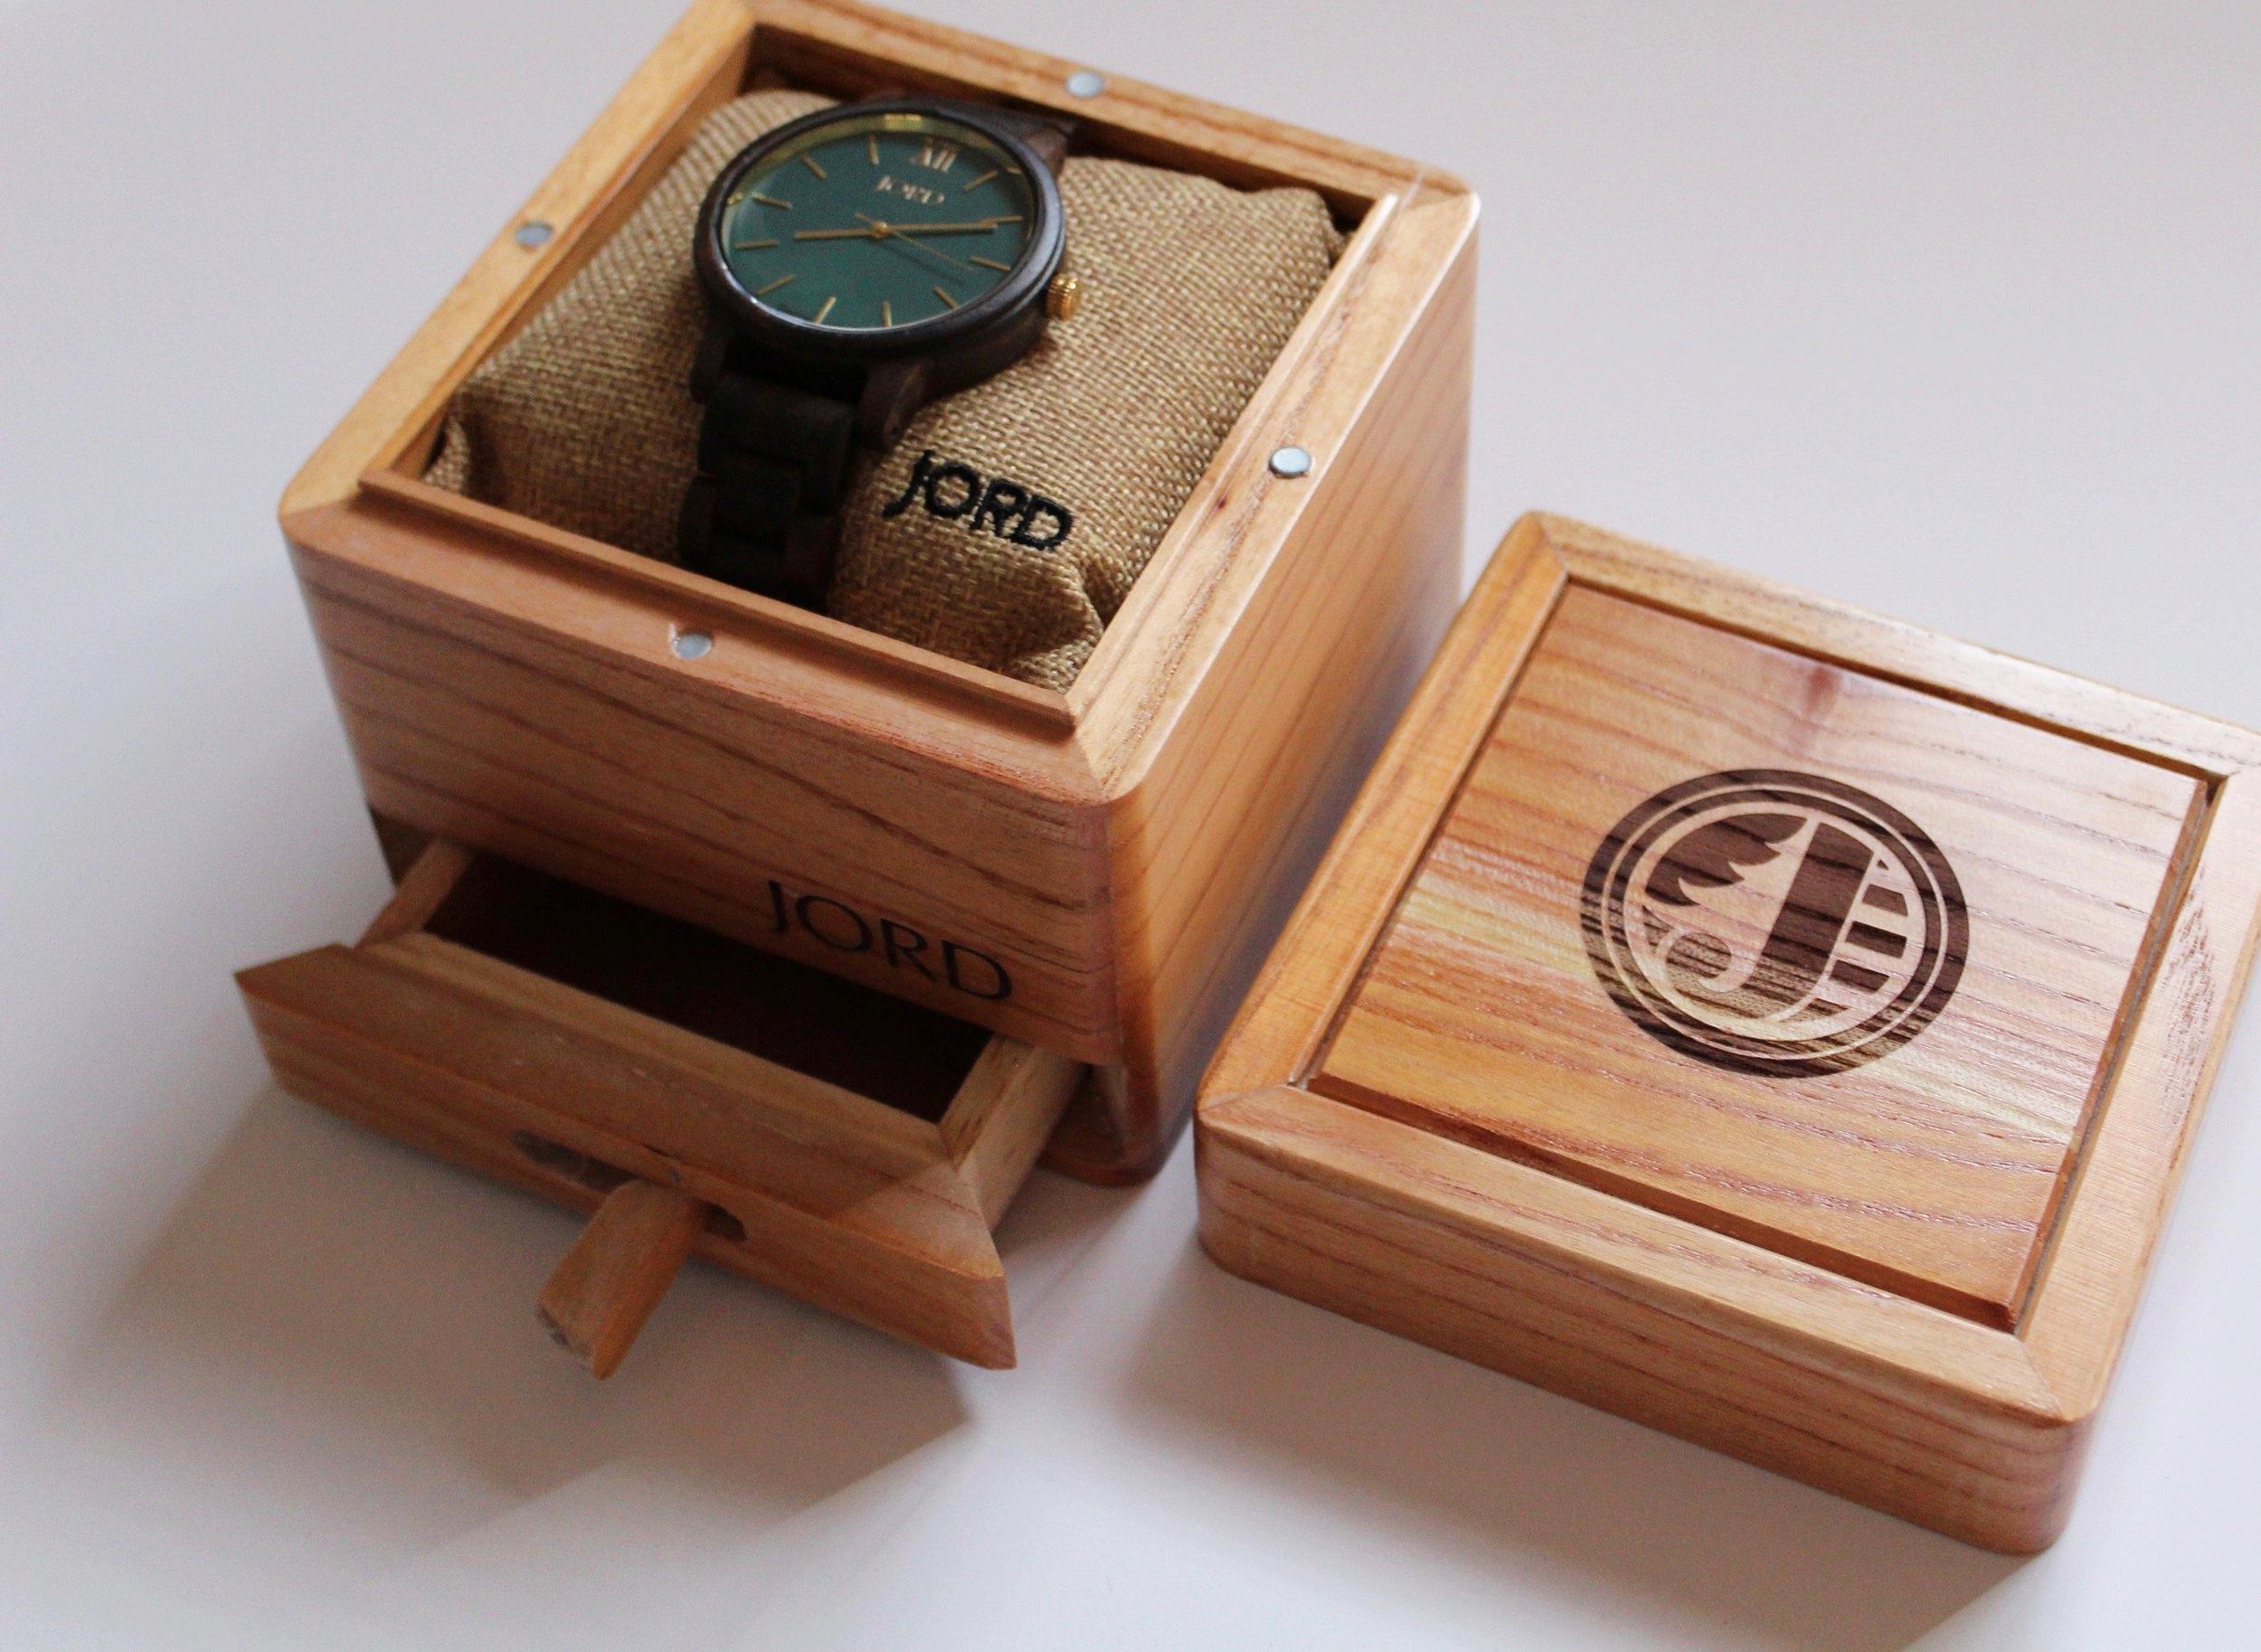 jordwood,jordwatch,jordwoodwatches,woodwatches,watch,timepiece,natural,lasvegas,lasvegasblogger.blogger